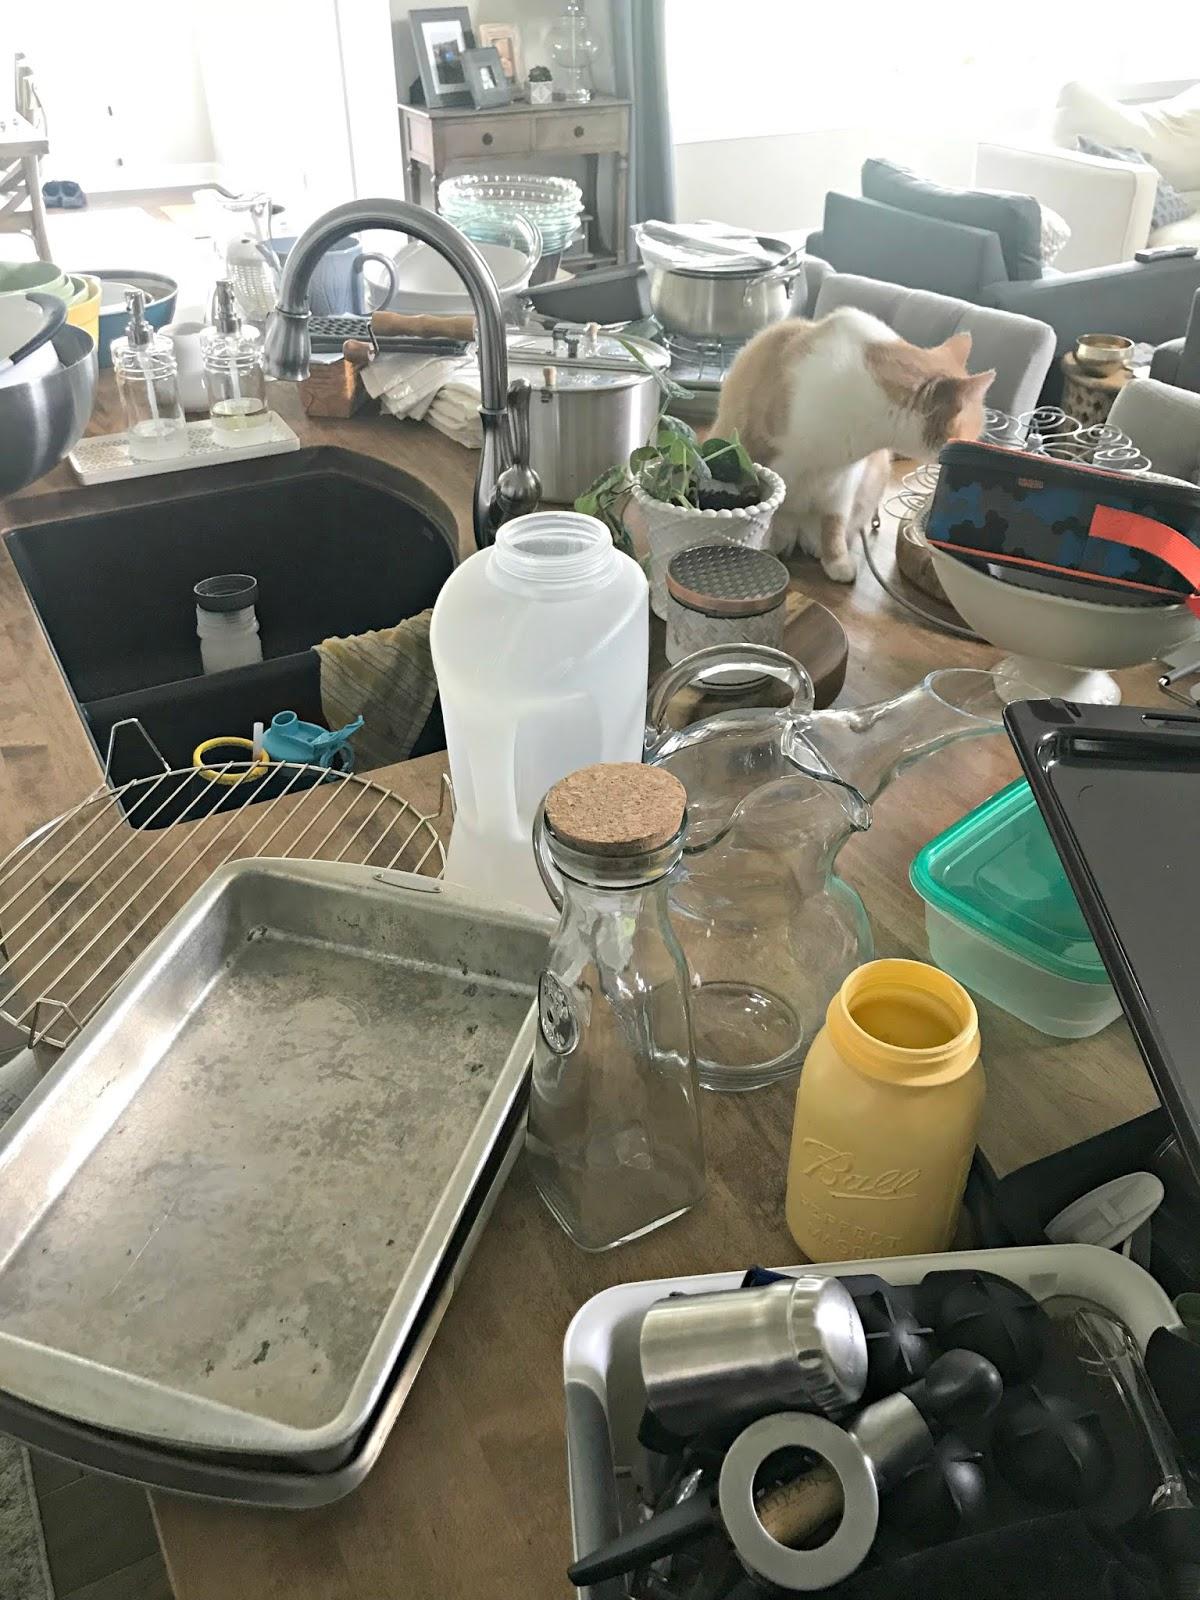 Organizing the kitchen cabinets